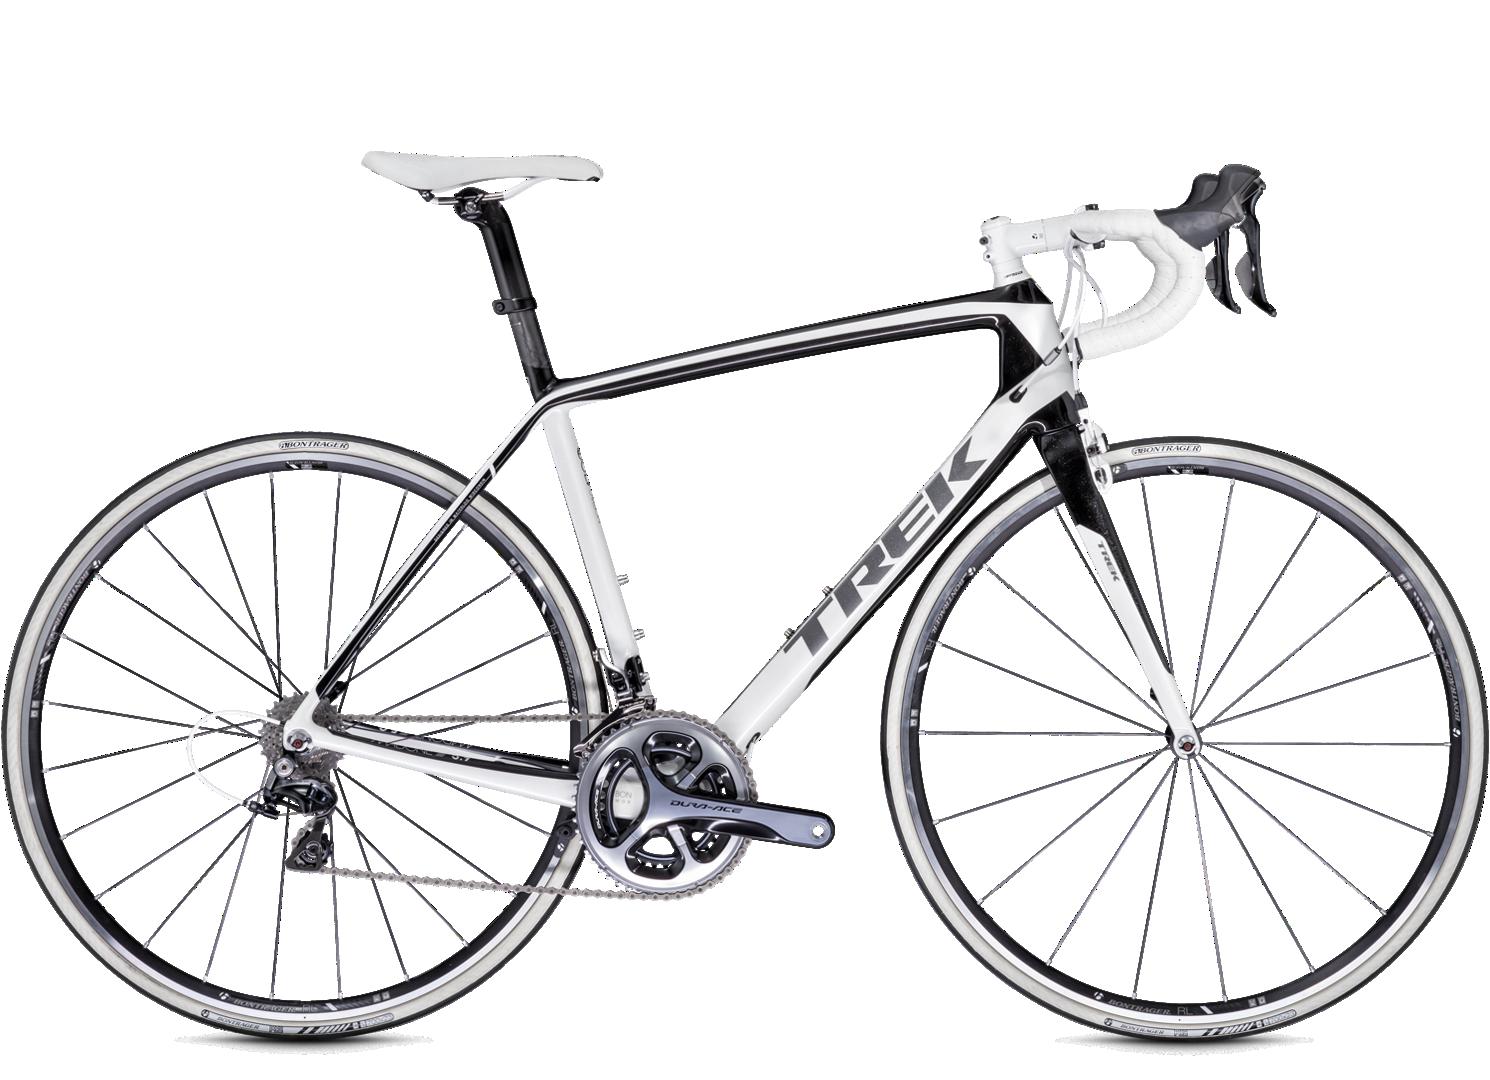 2014 Madone 5 9 H2 Compact Dura-Ace - Bike Archive - Trek